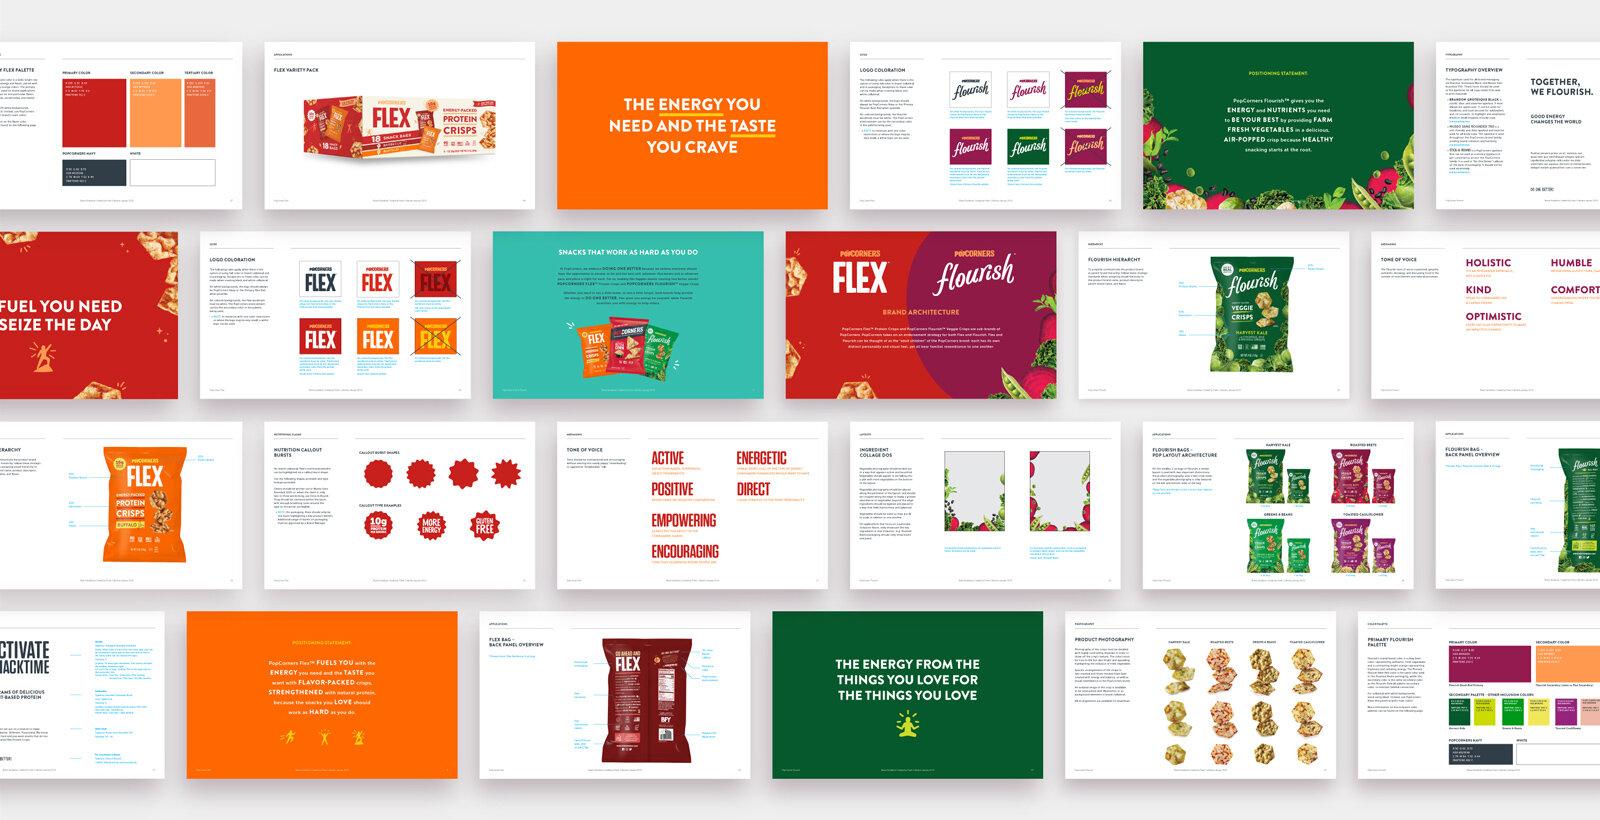 Excerpts from Flex & Flourish Brand Guidelines